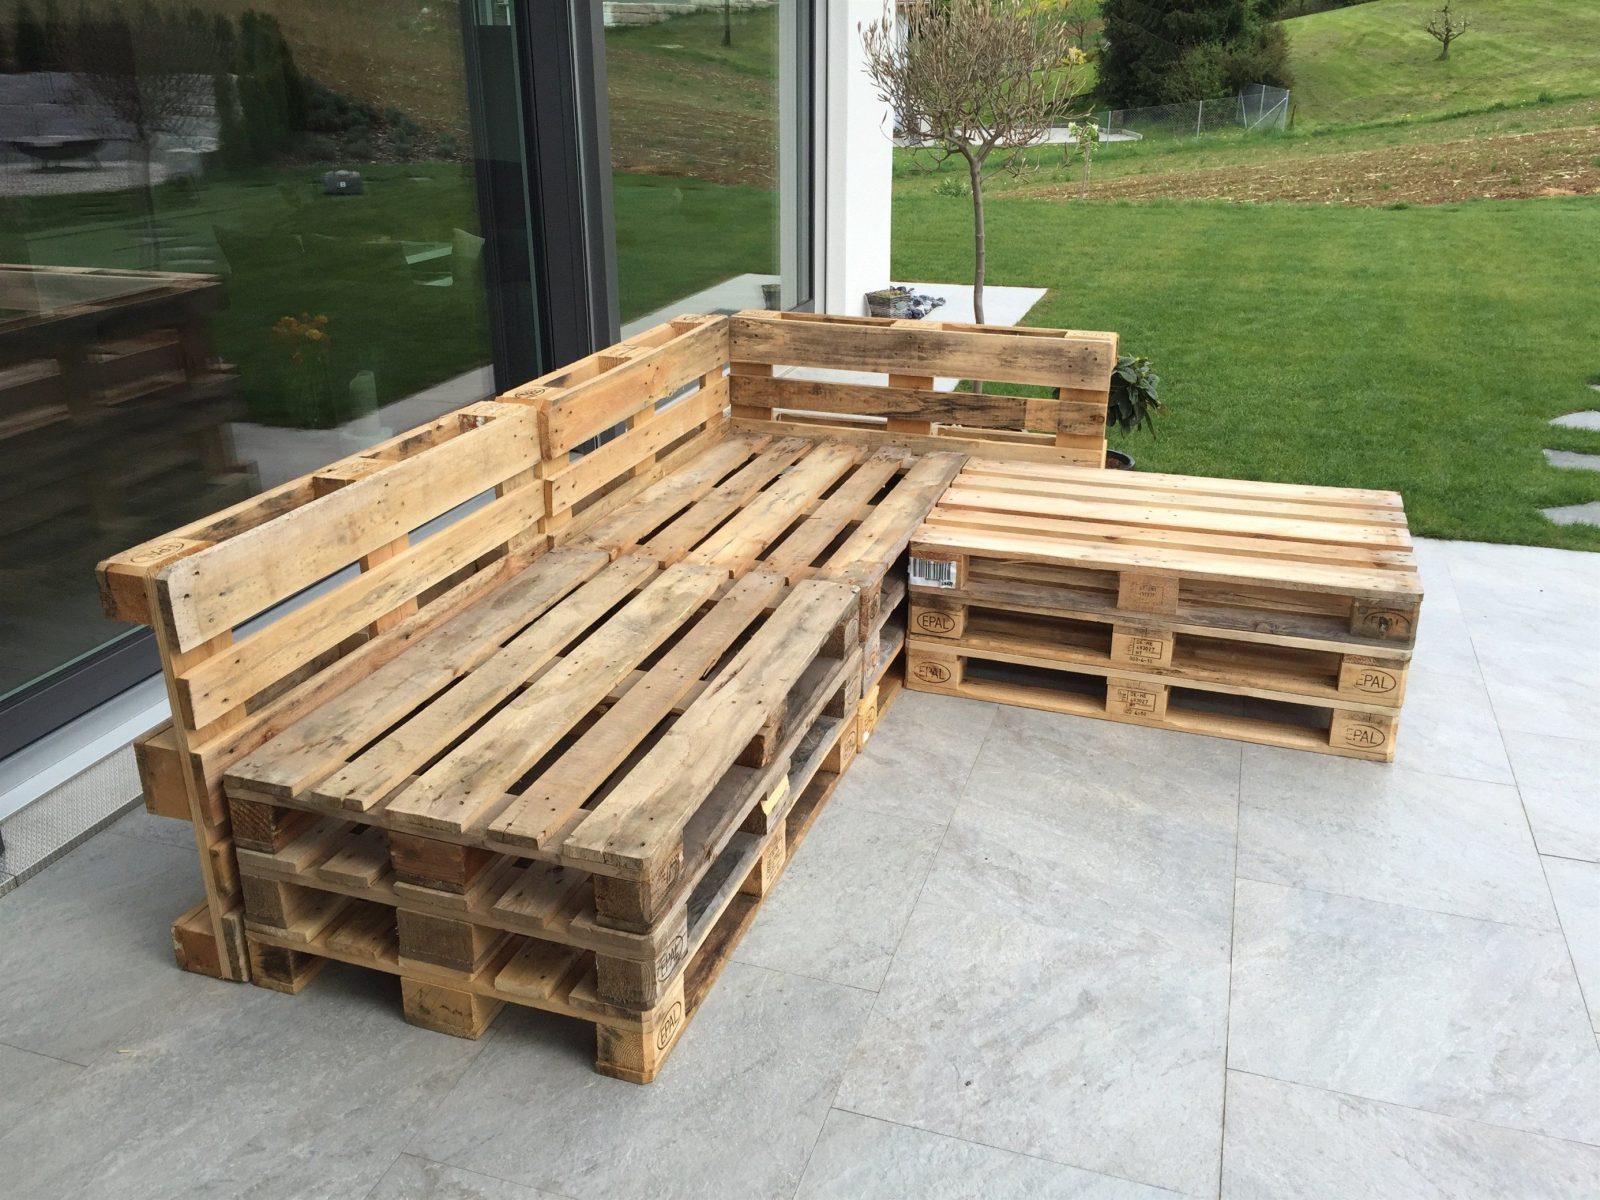 Lounge Gartenmöbel Holz Selber Bauen Dm26 – Hitoiro von Gartenstuhl Holz Selber Bauen Bild